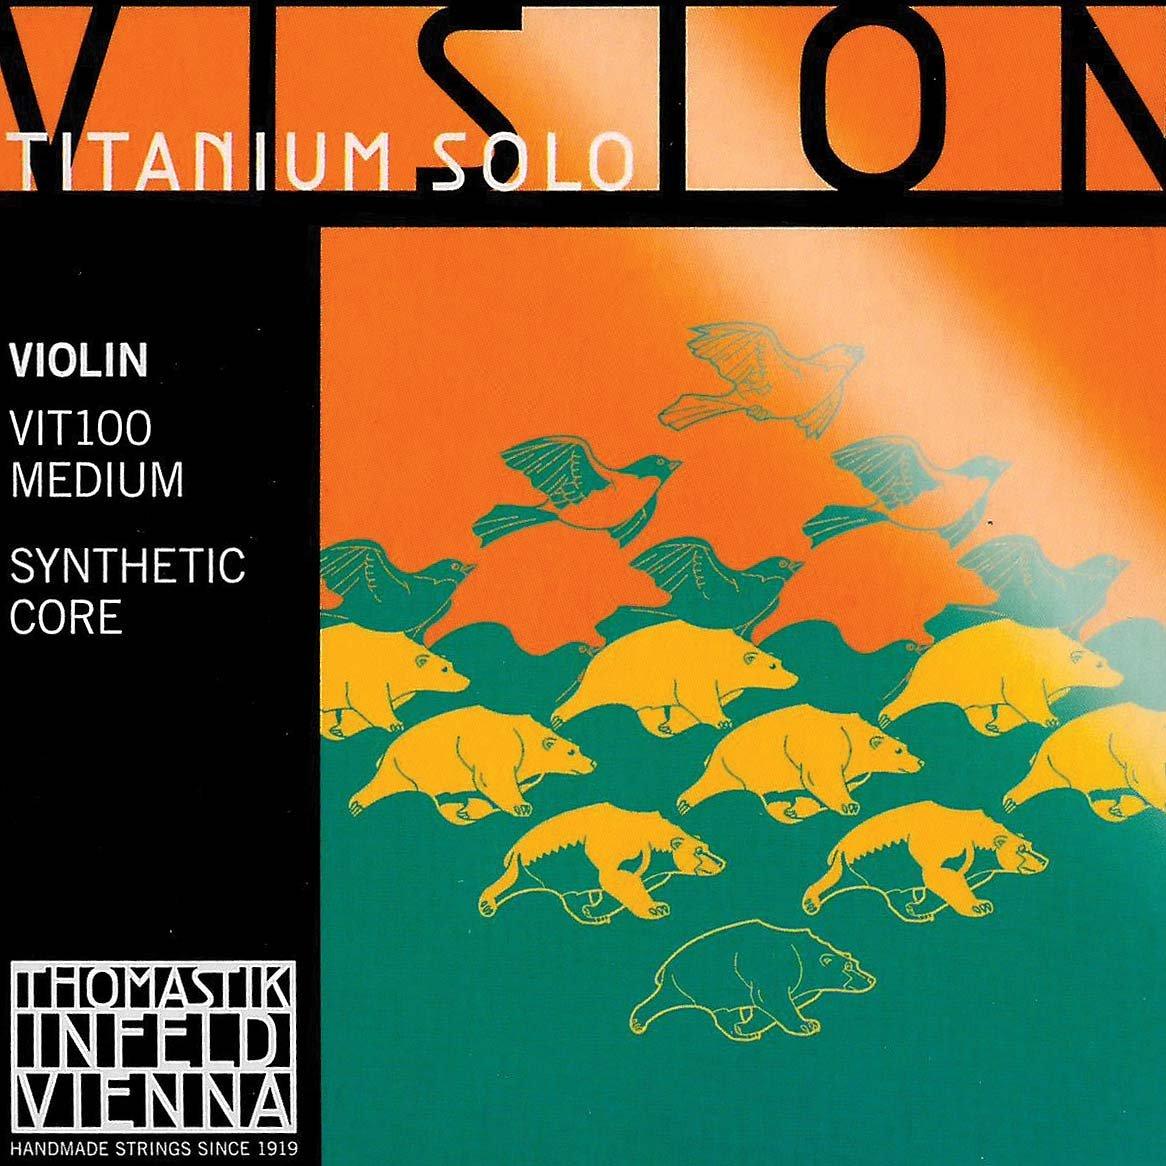 Thomastik Vision Titanium Solo 4/4 Violin String Set - Medium Gauge BHBU0503A802